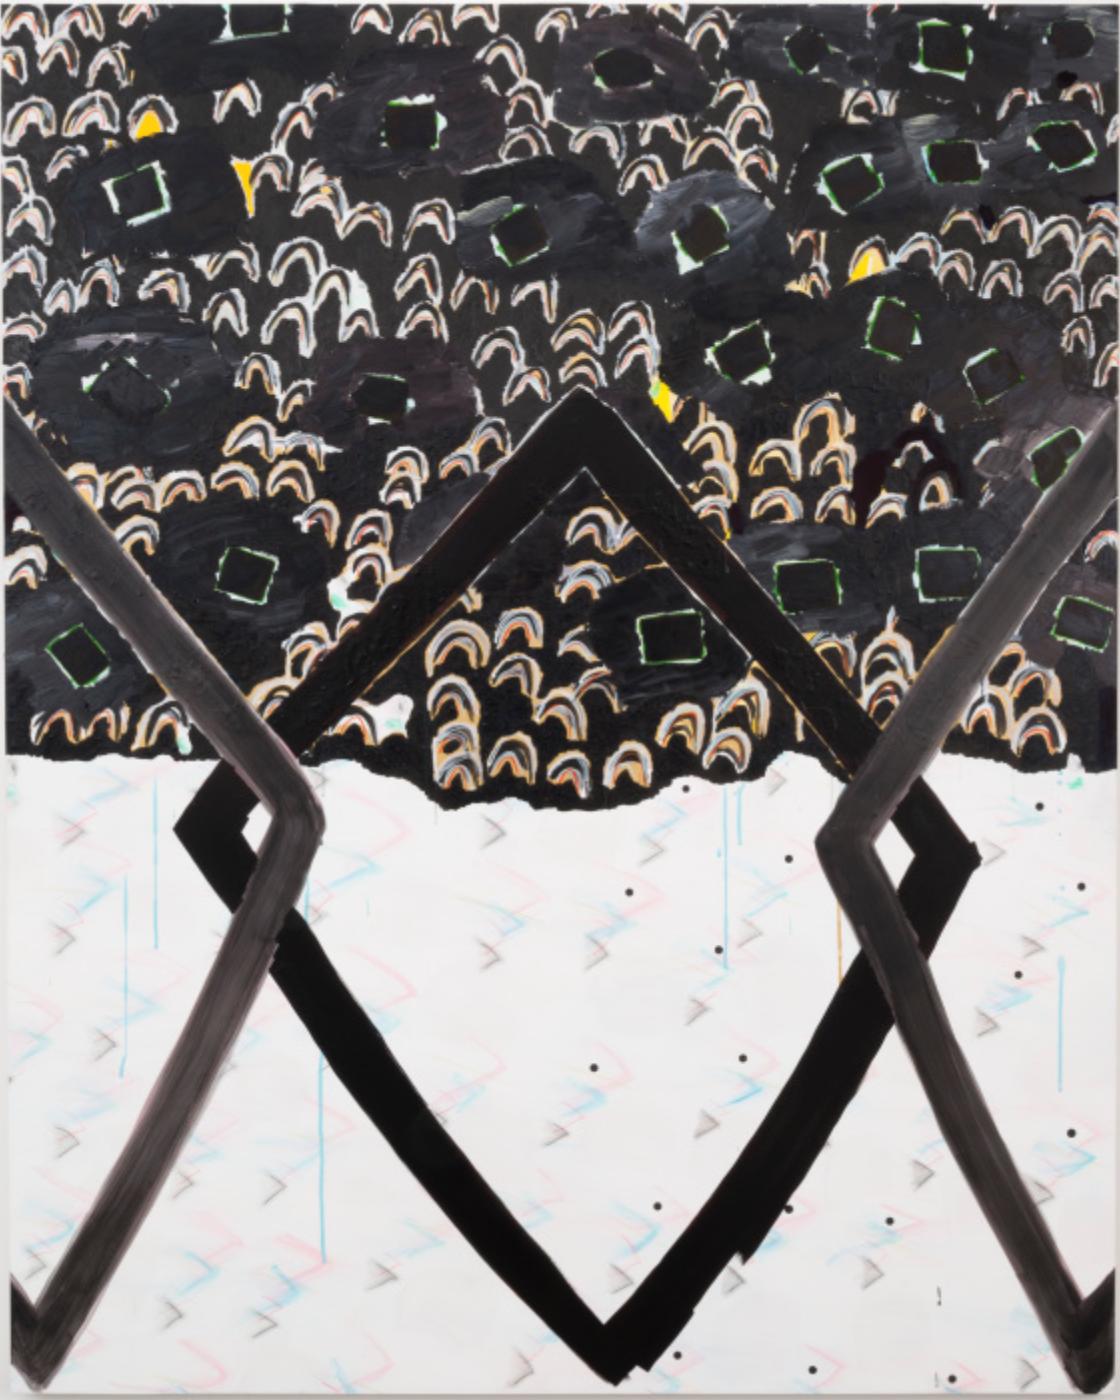 Mia Christopher | Amazing art, Art, Visual